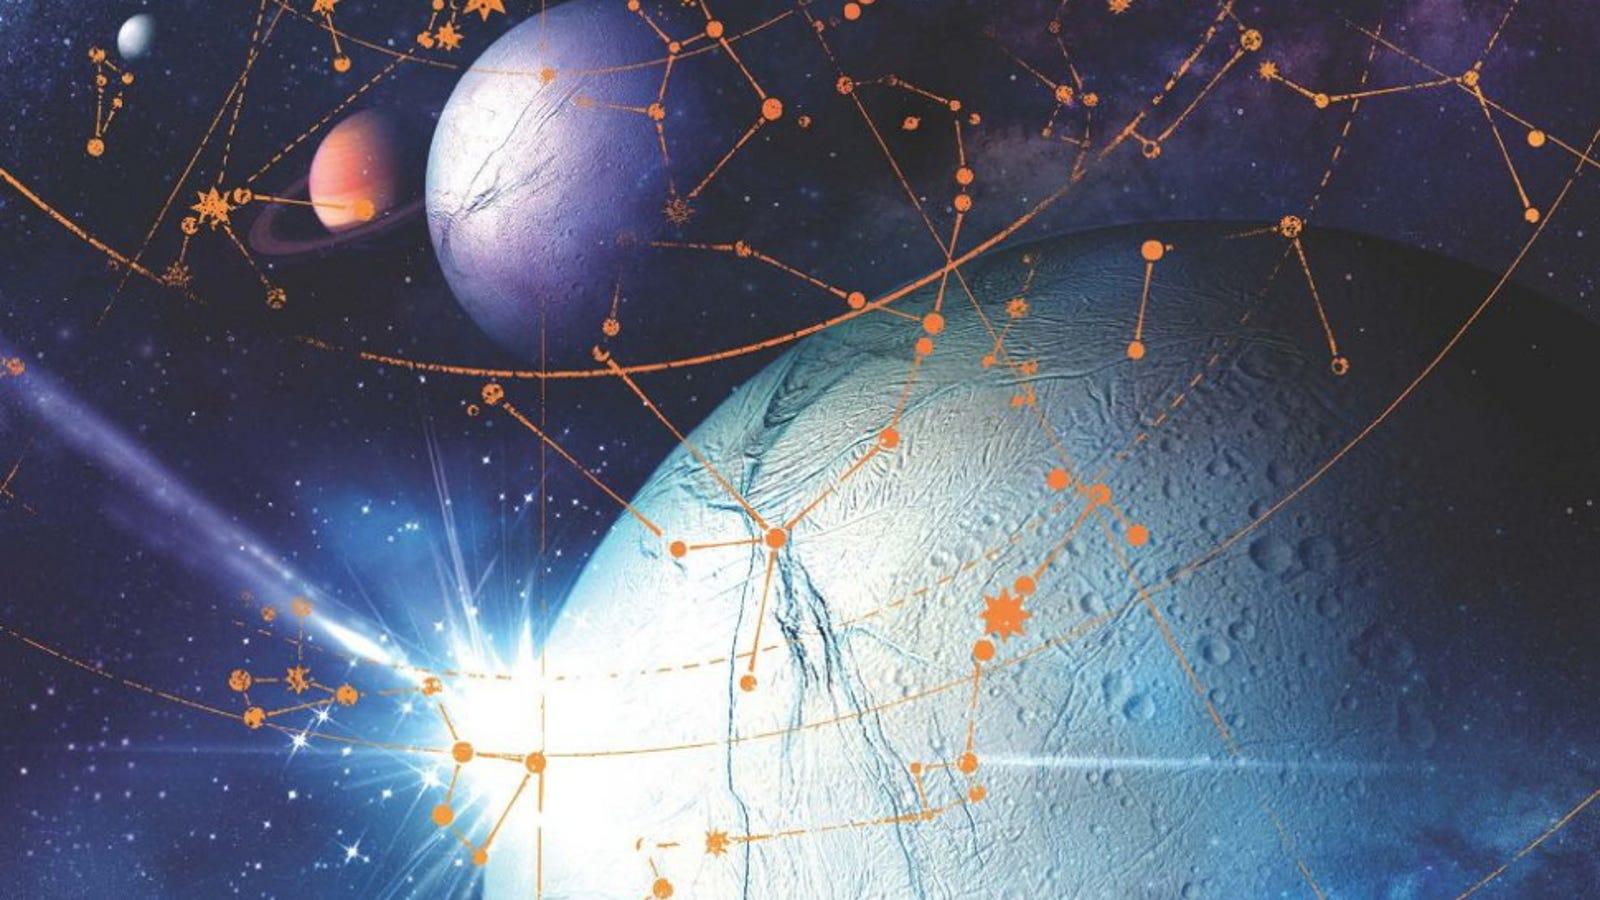 Take a wild trip to our nearest stellar neighbor in Proxima